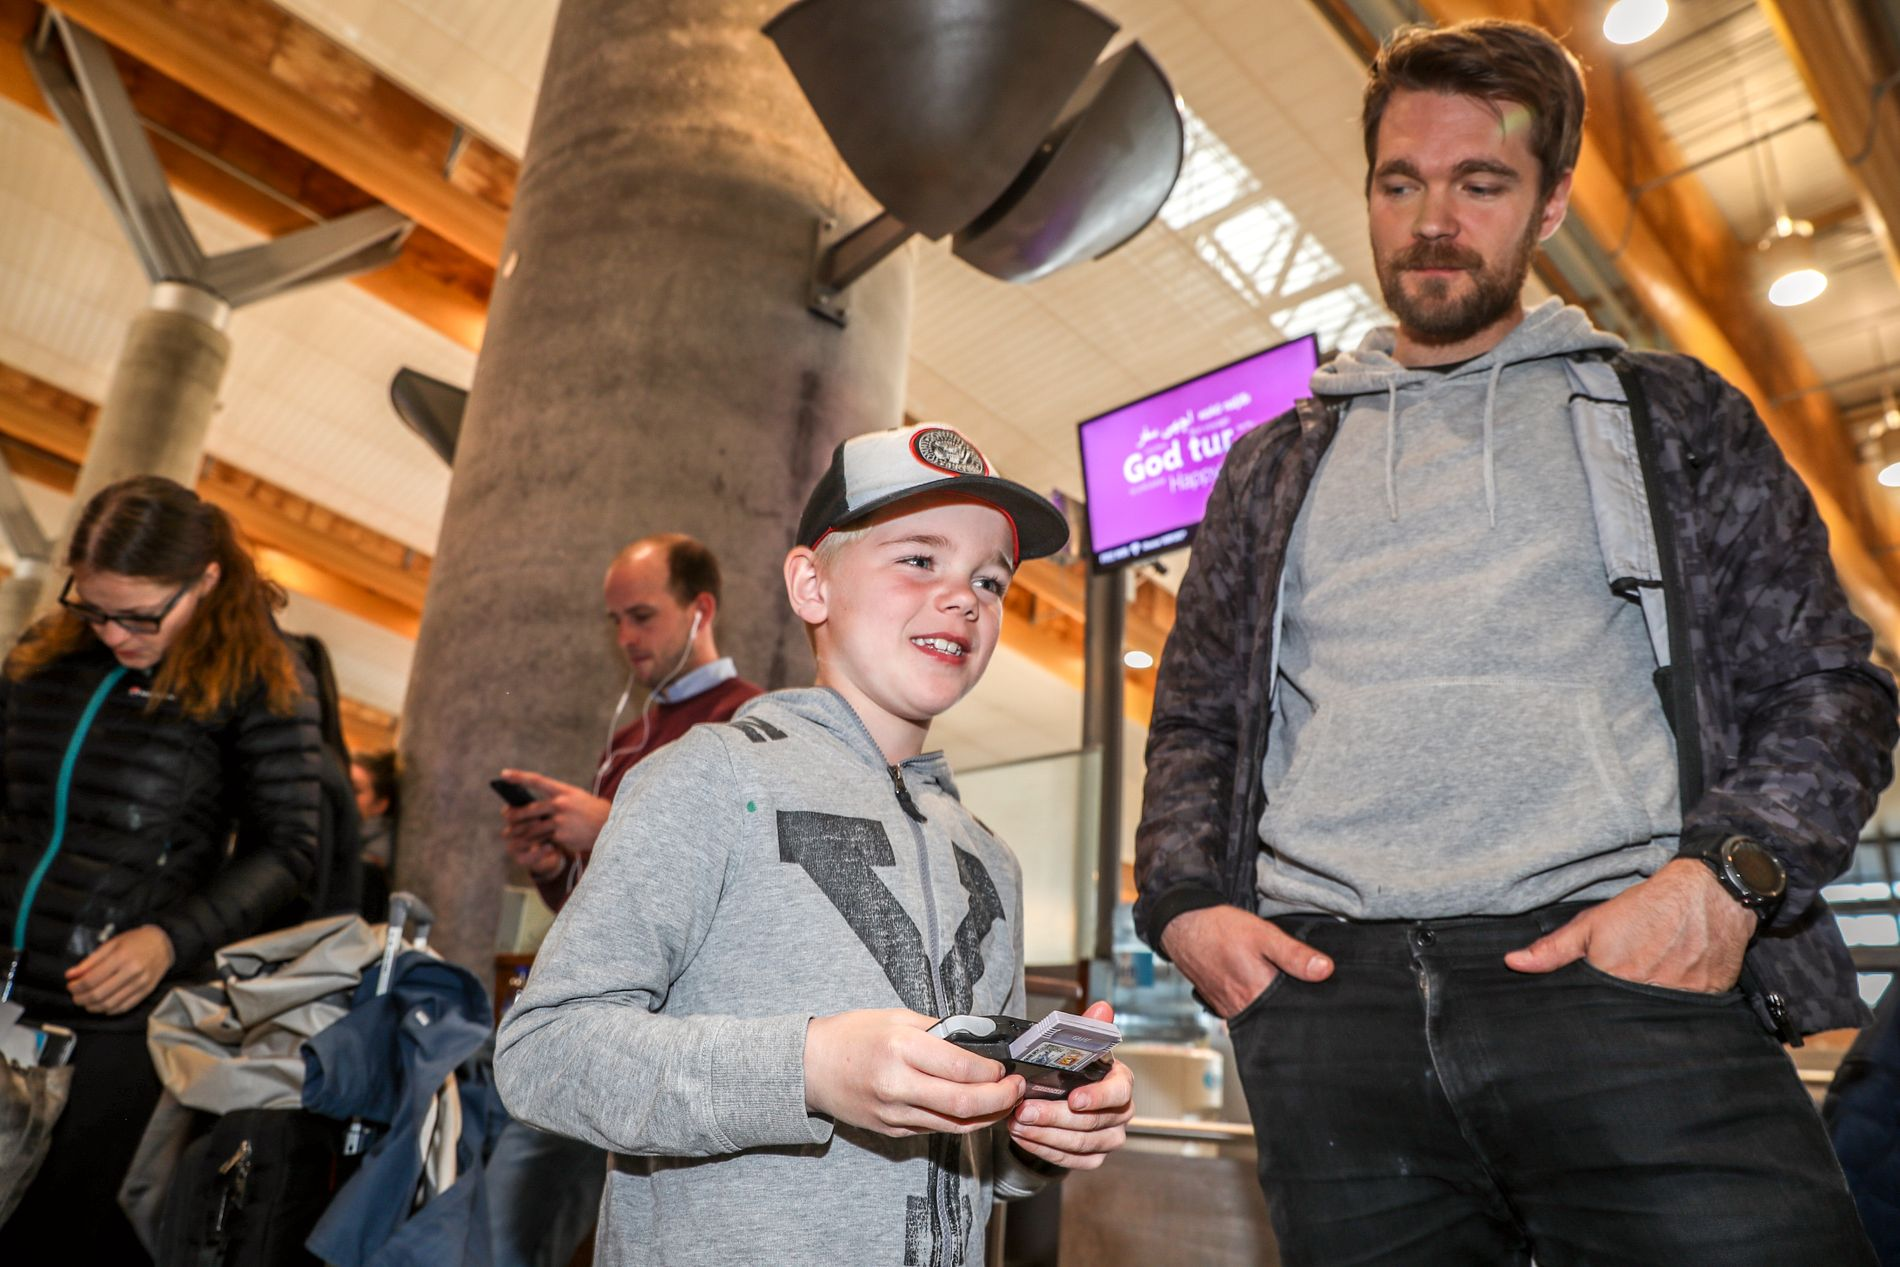 VIL REKKE KAMP: Falk (7) skal på sin første storkamp i Leeds søndag sammen med pappa Jan Tore Klausen (34).